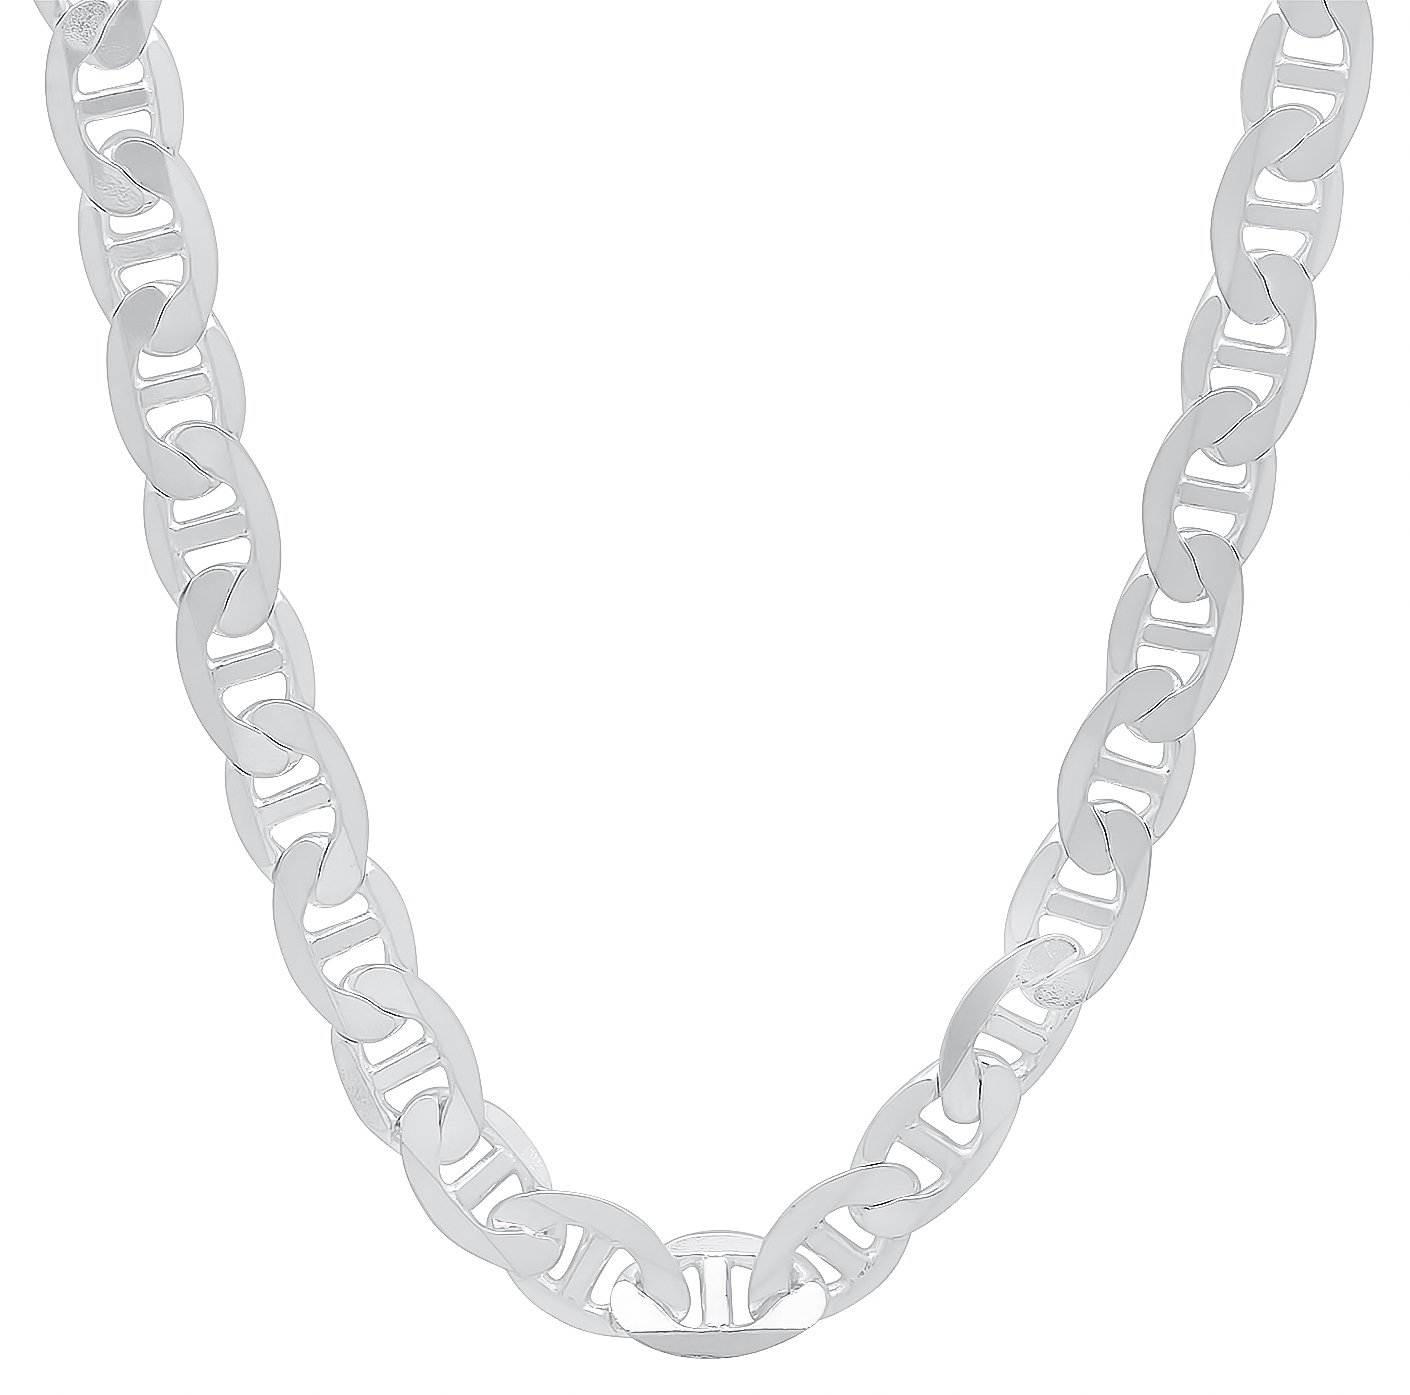 5.3mm 925 Sterling Silver Nickel-Free Flat Mariner Link Italian Chain, 20'' + Bonus Polishing Cloth